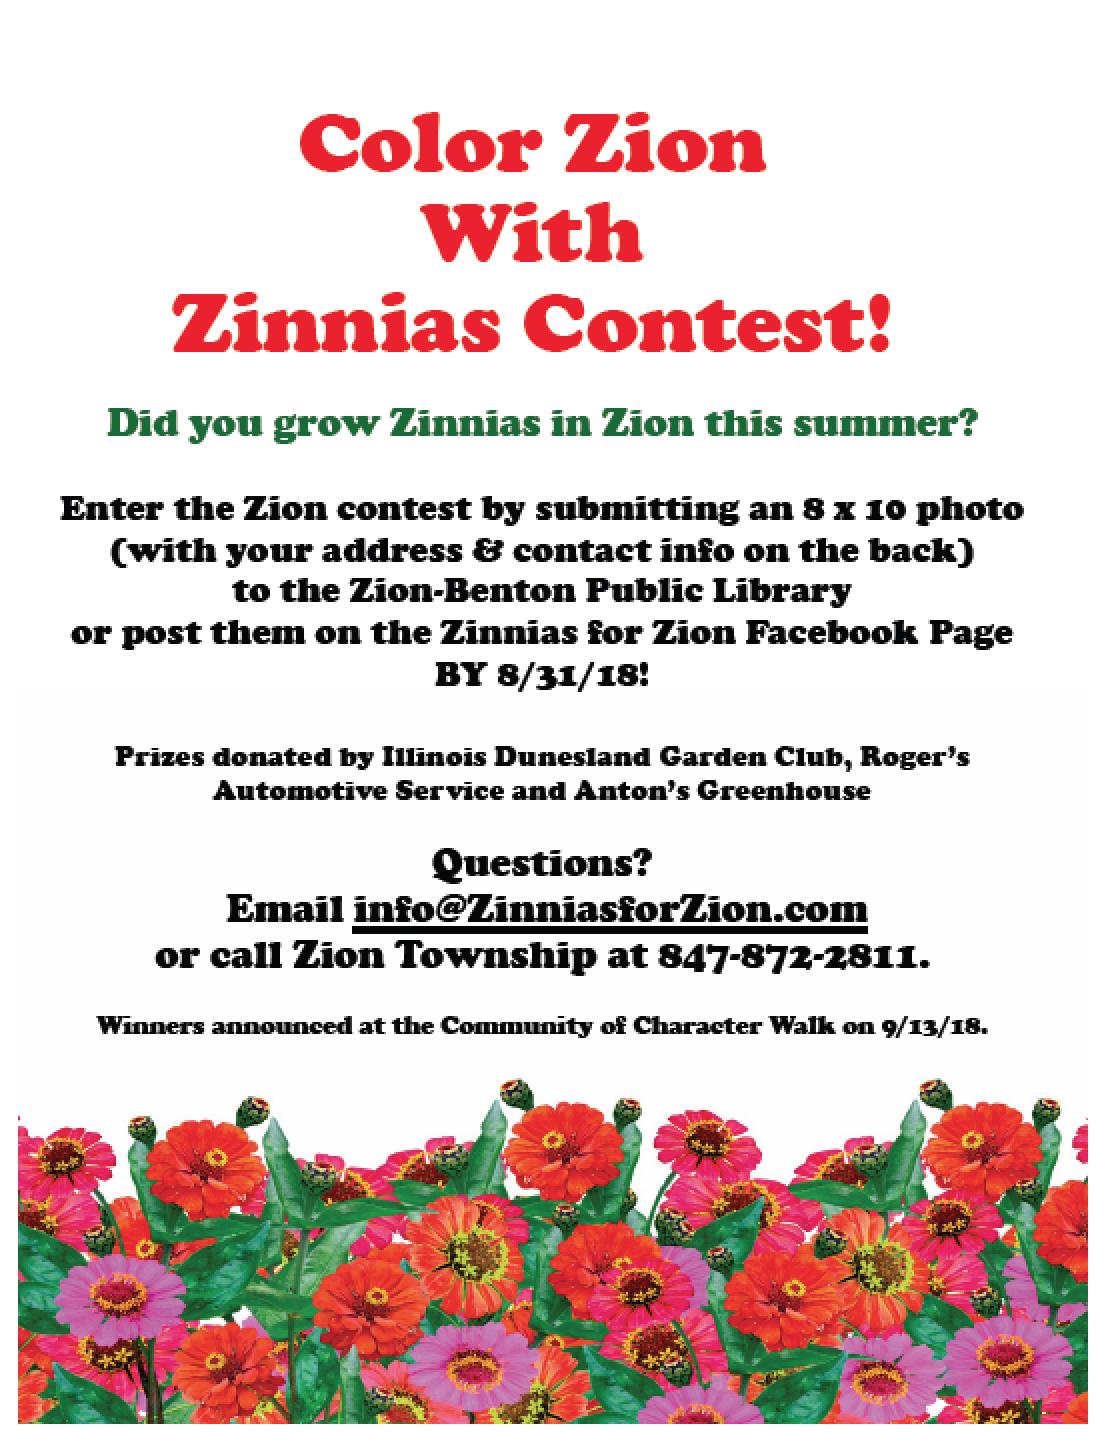 Zinnias for Zion Yard Contest!!! (Zion Township) &mdash